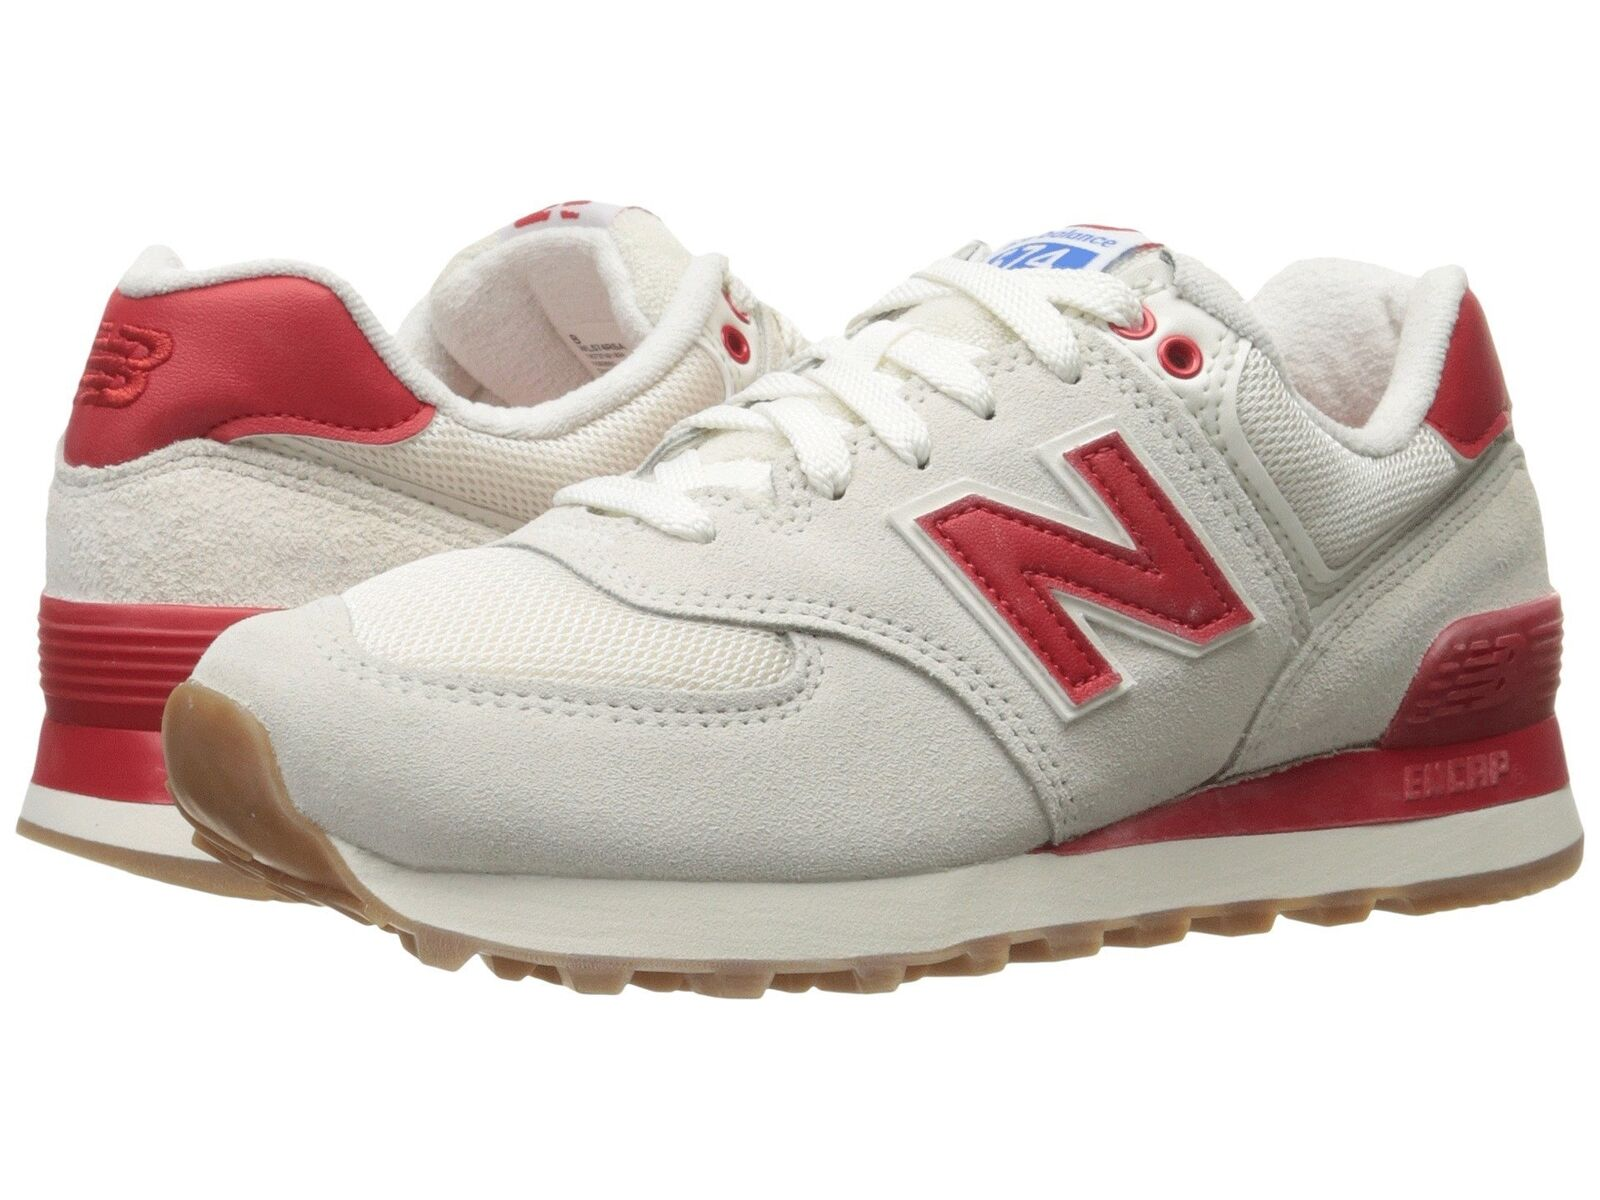 New Balance Women's Fashion Sneakers 574 Retro Sport Sea Salt Red WL574RSA